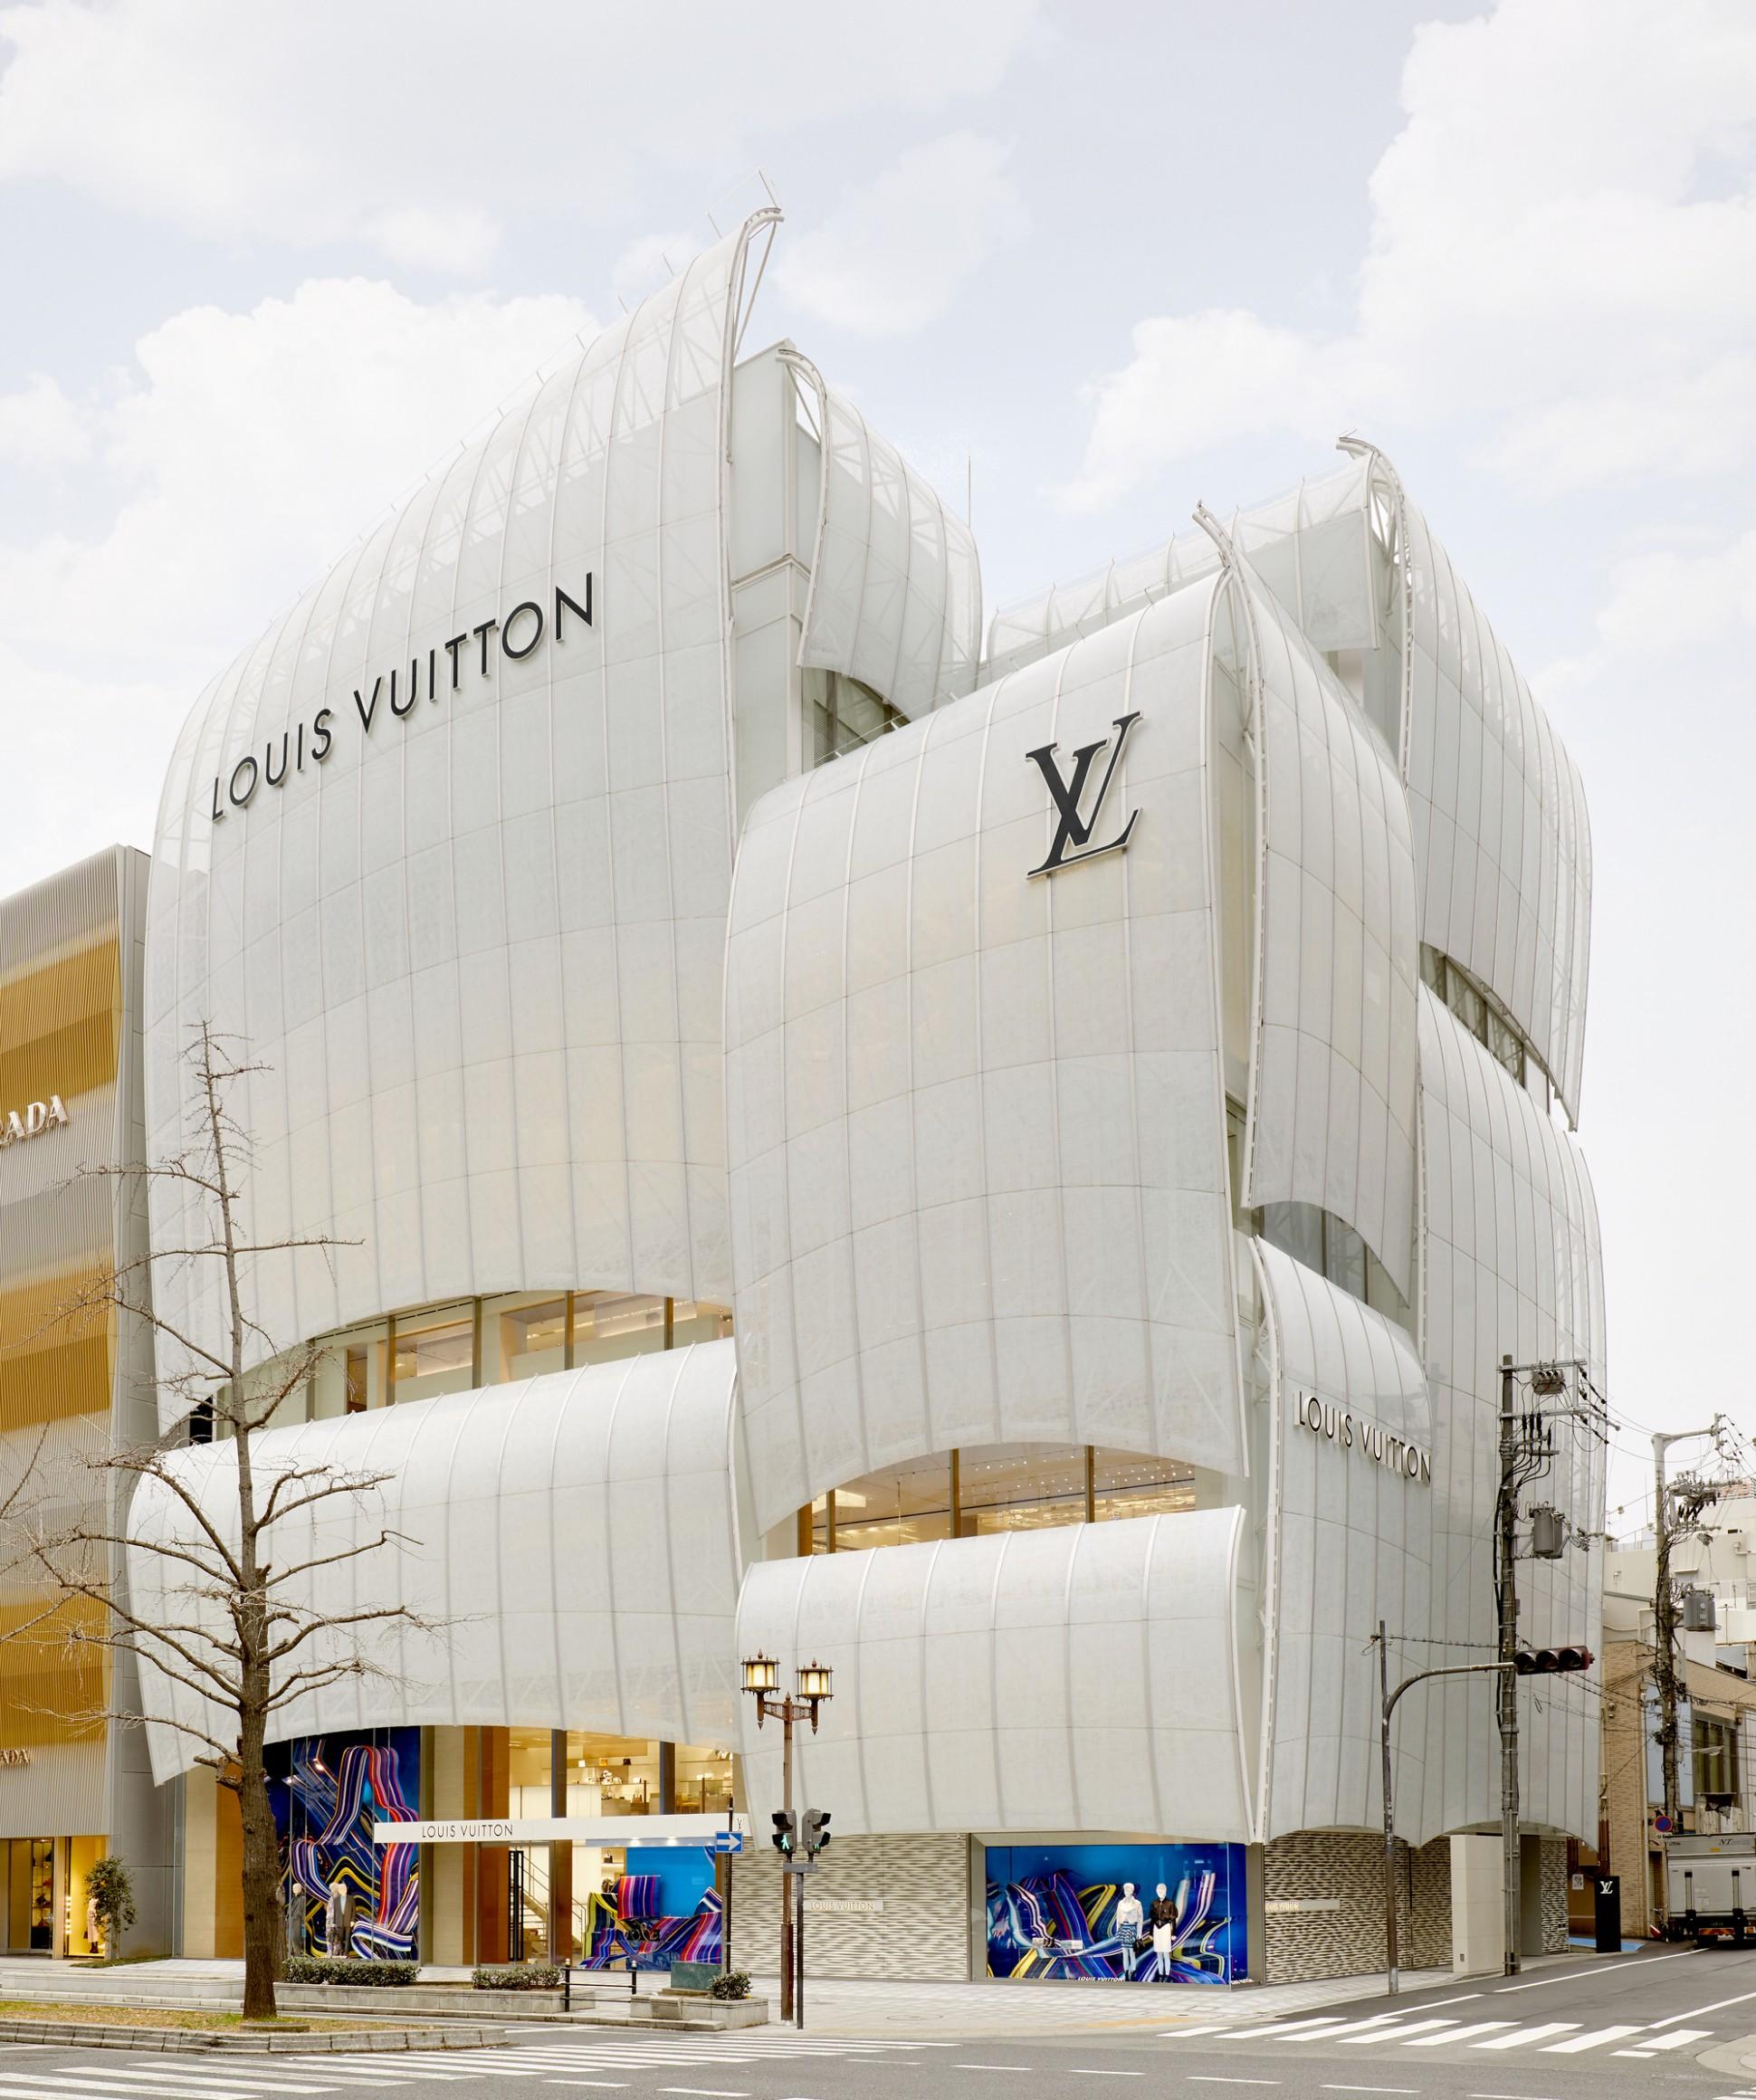 LOUIS VUITTON Maison Osaka Midosuji / Jun Aoki & Associates  - Design Apartment Next To Louis Vuitton Building